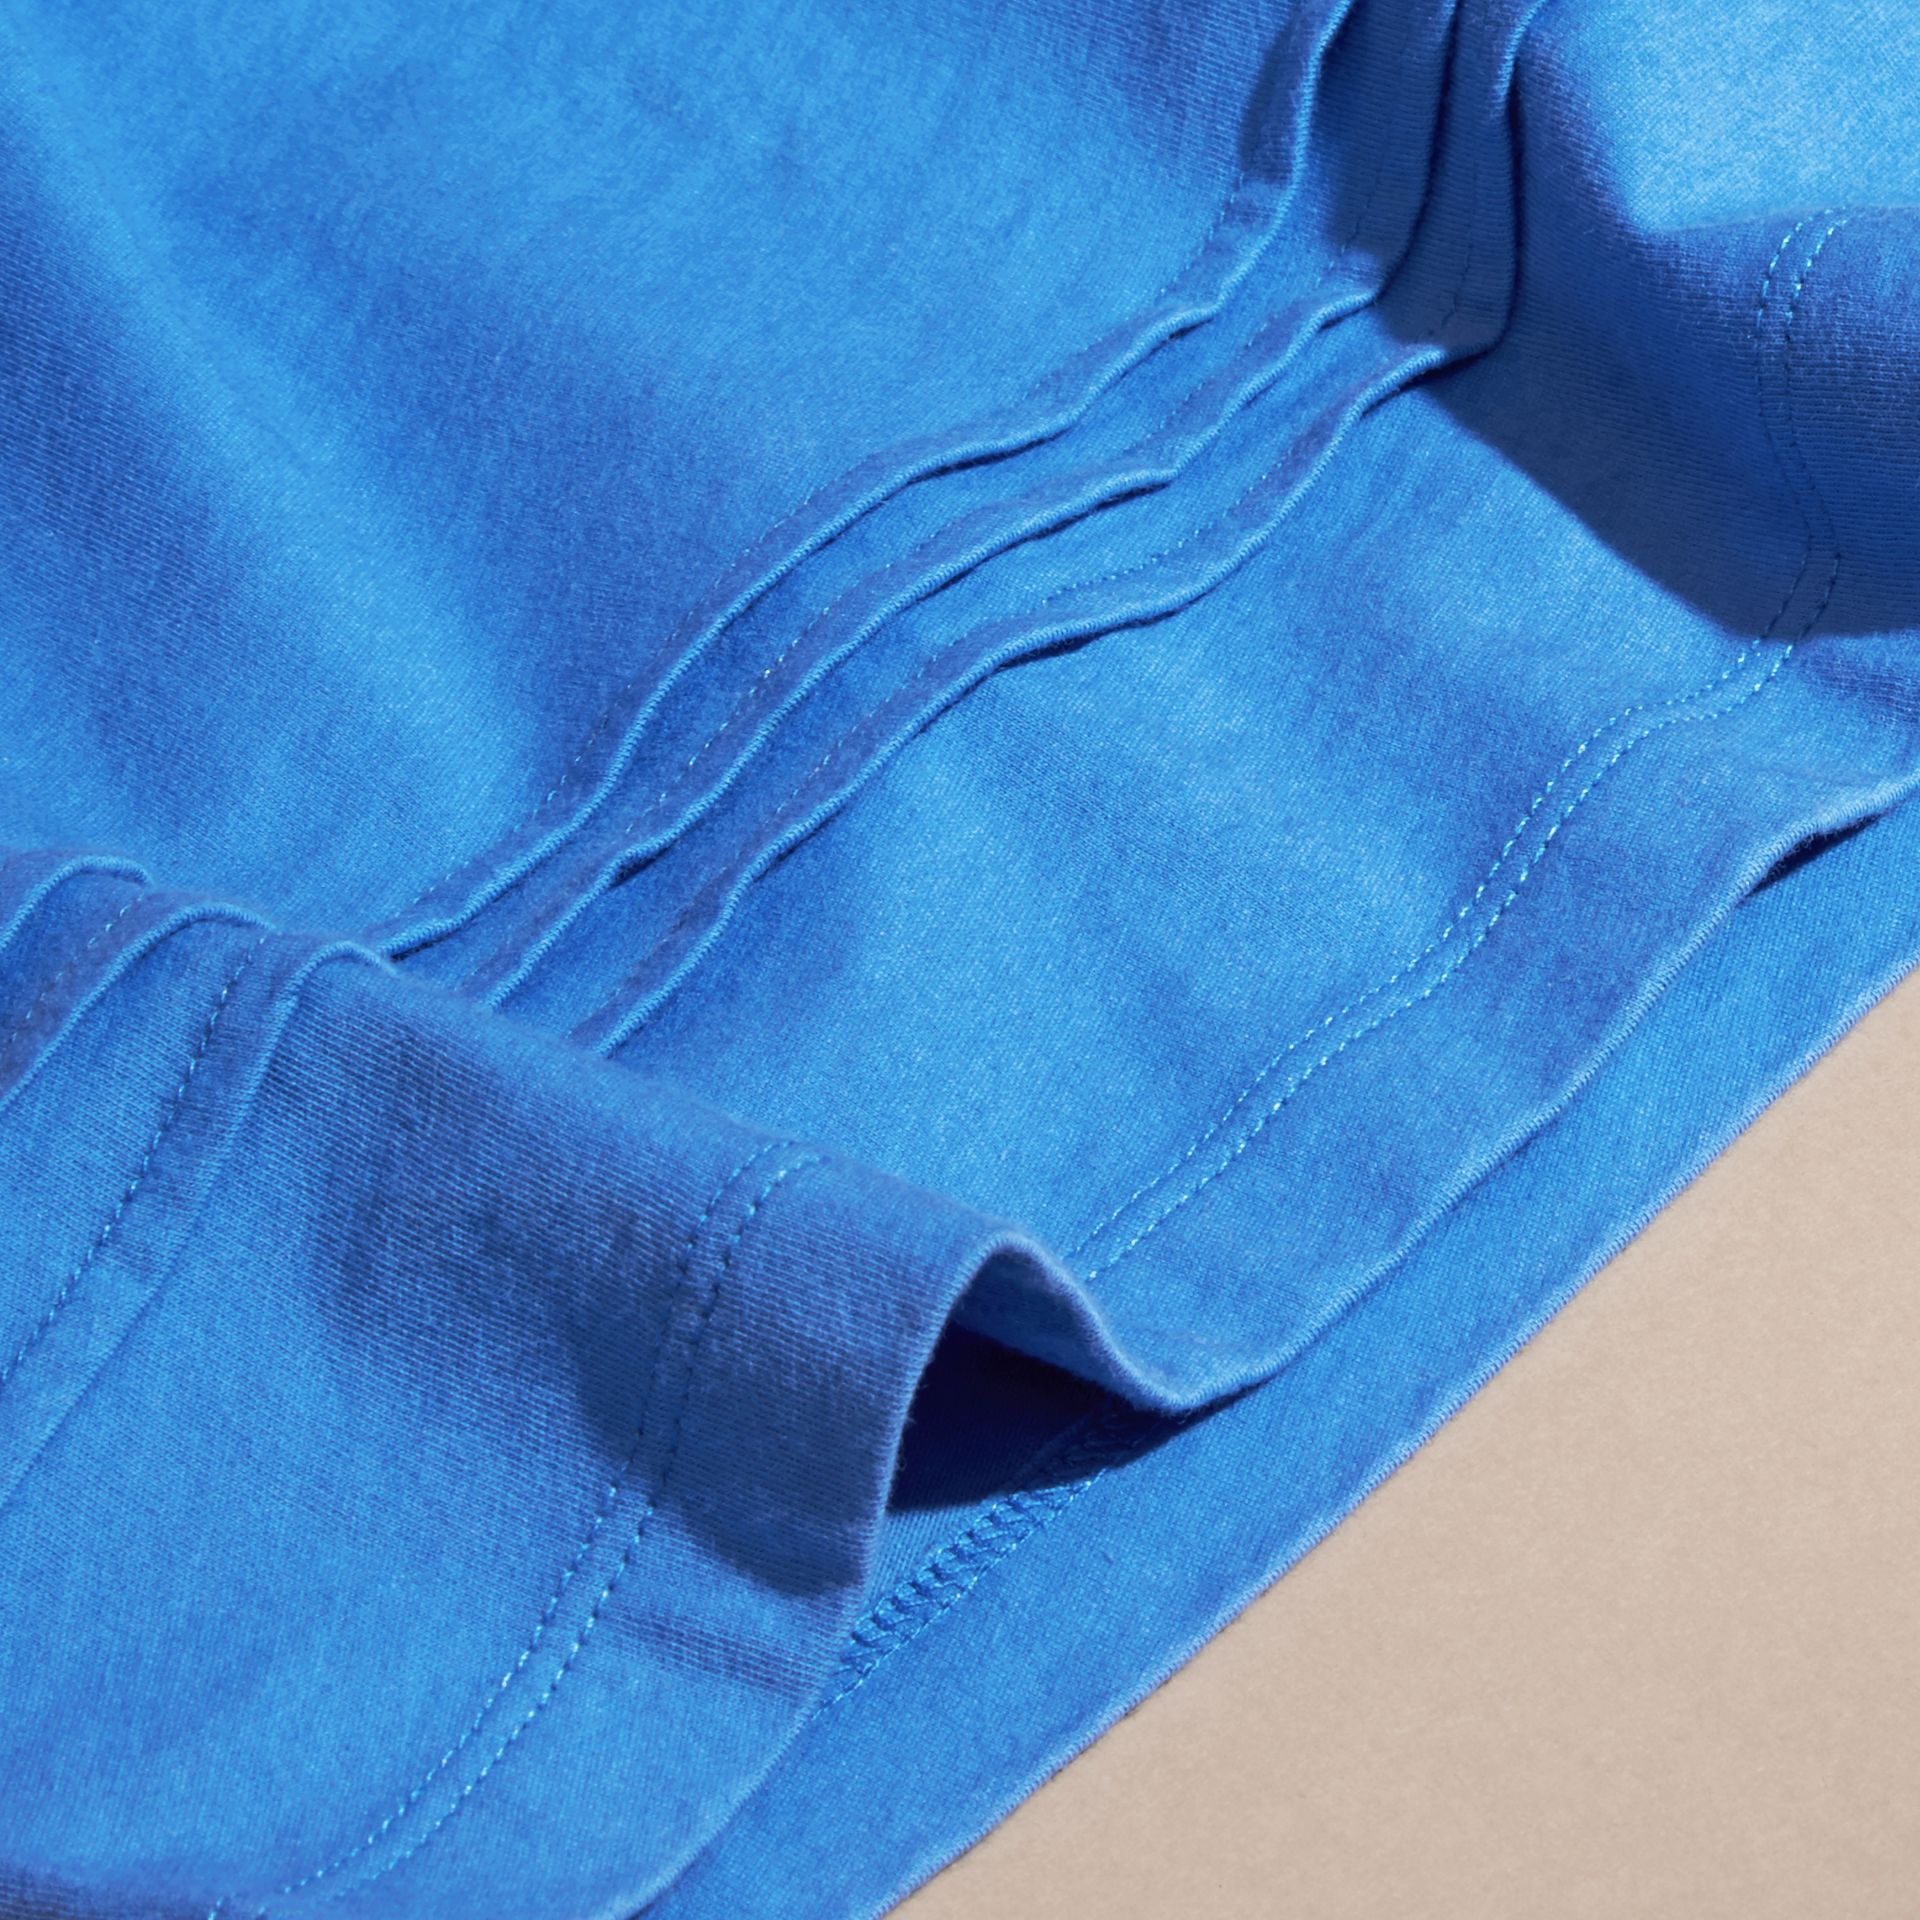 Bleu hortensia vif T-shirt à plis en coton à motif check Bleu Hortensia Vif - photo de la galerie 2